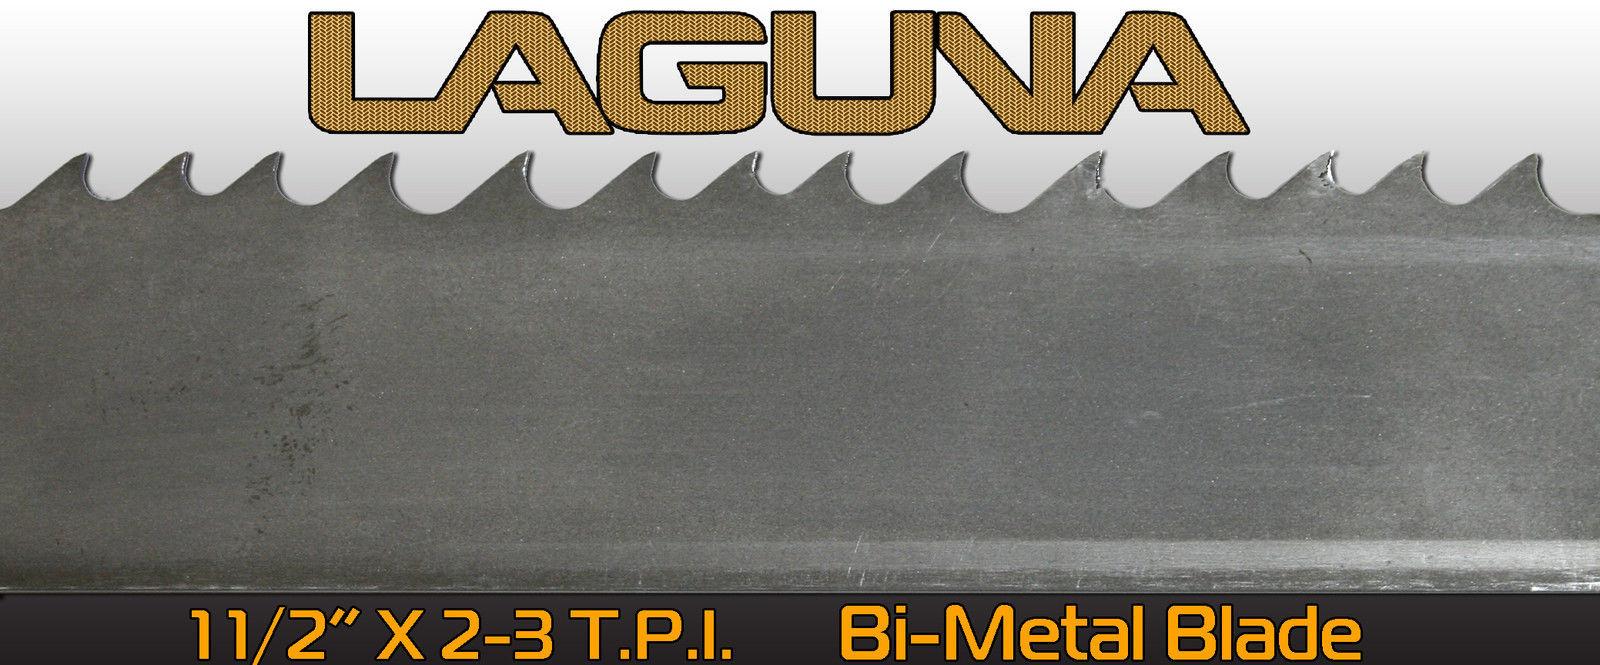 "1 1/2"" 2-3 TPI X 154"" Bimetal BandSaw Blade Laguna Tools Metal Cutting Blade"